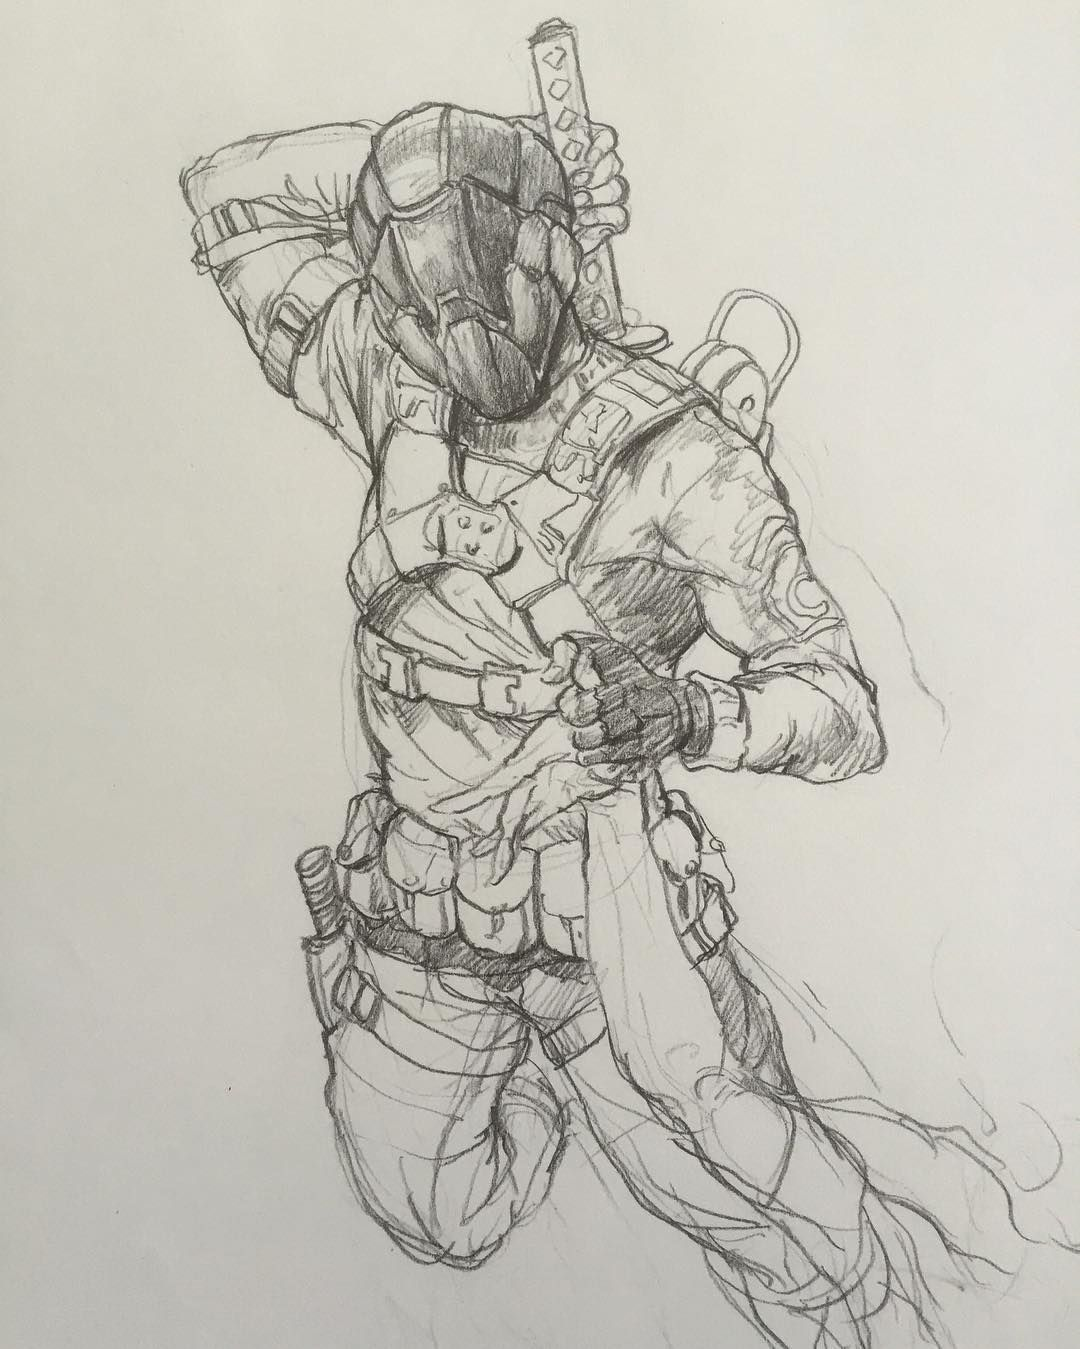 Sketchbook sketch sketching ninja samurai warrior doodle drawing pencildrawing pencil fighter powerrangers